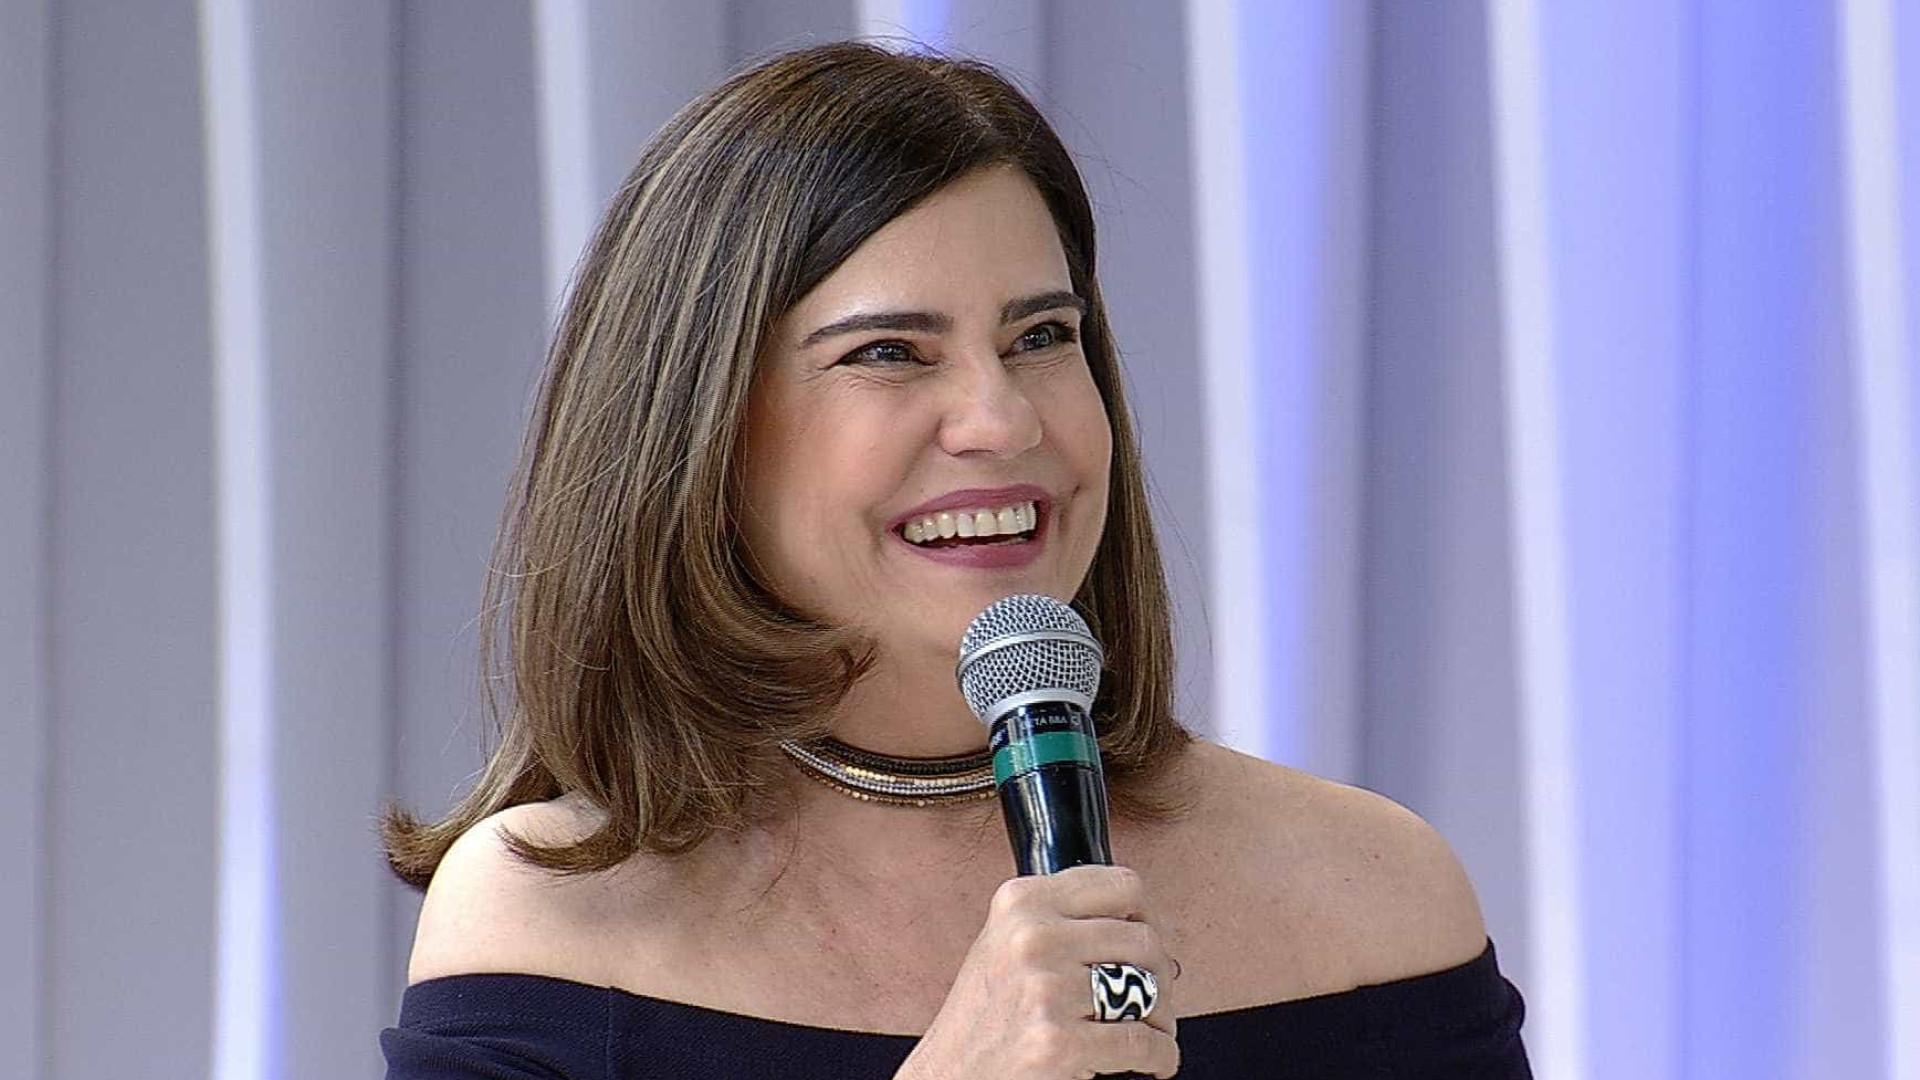 Longe de novelas, atriz lamenta falta de papeis: 'Já bati na porta'